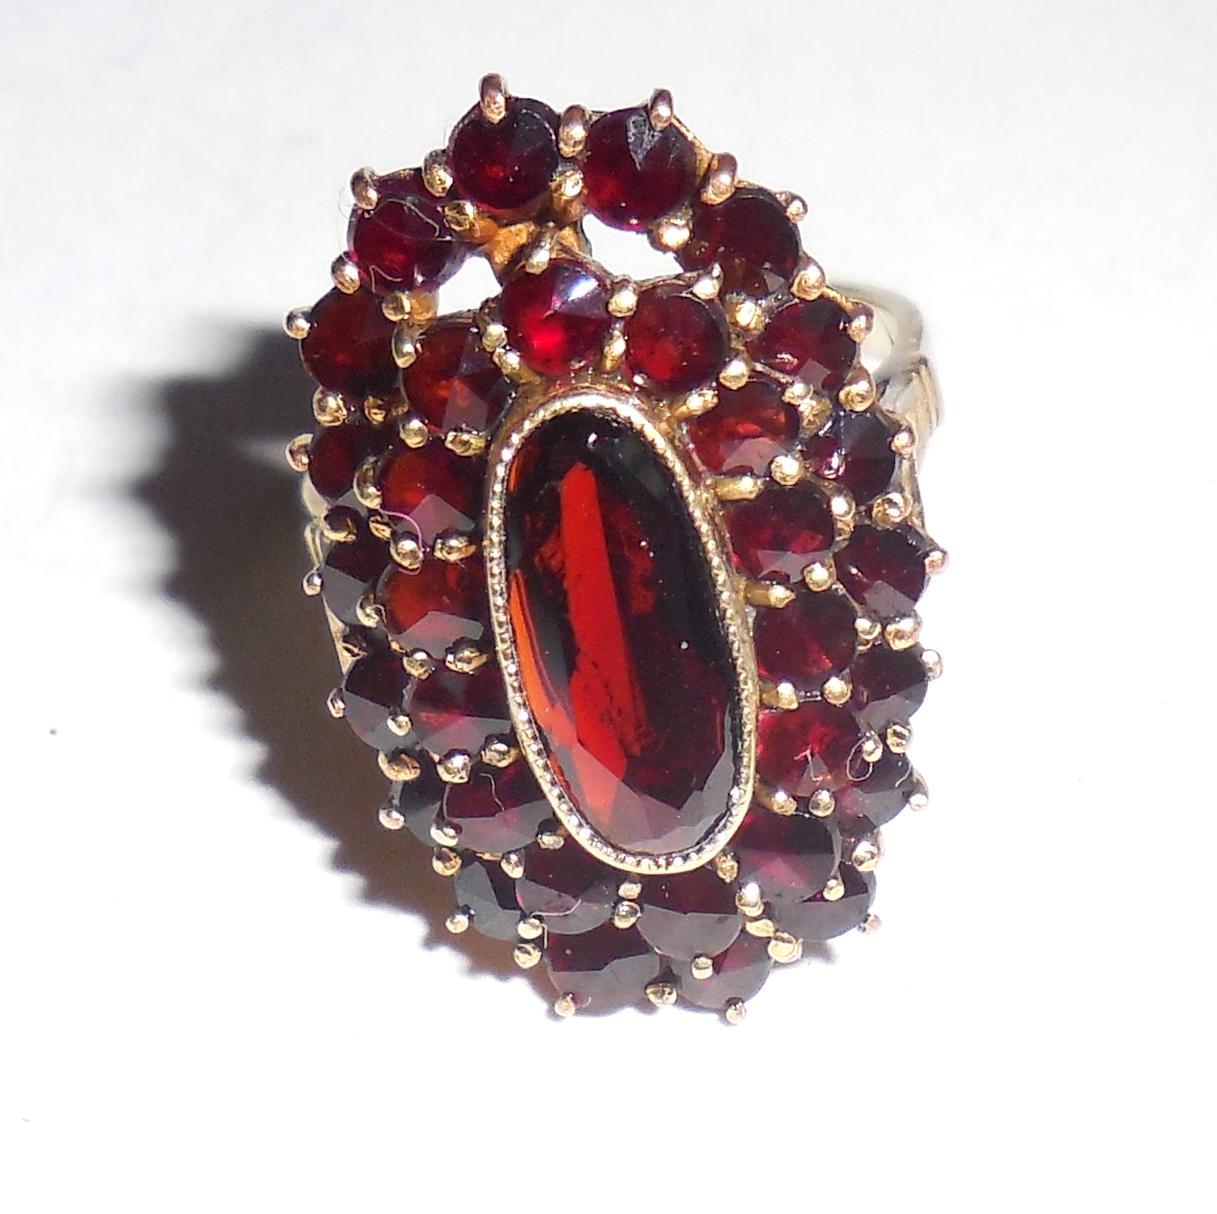 Antique Art Deco 14K Gold Bohemian Garnet Ring 51CTS